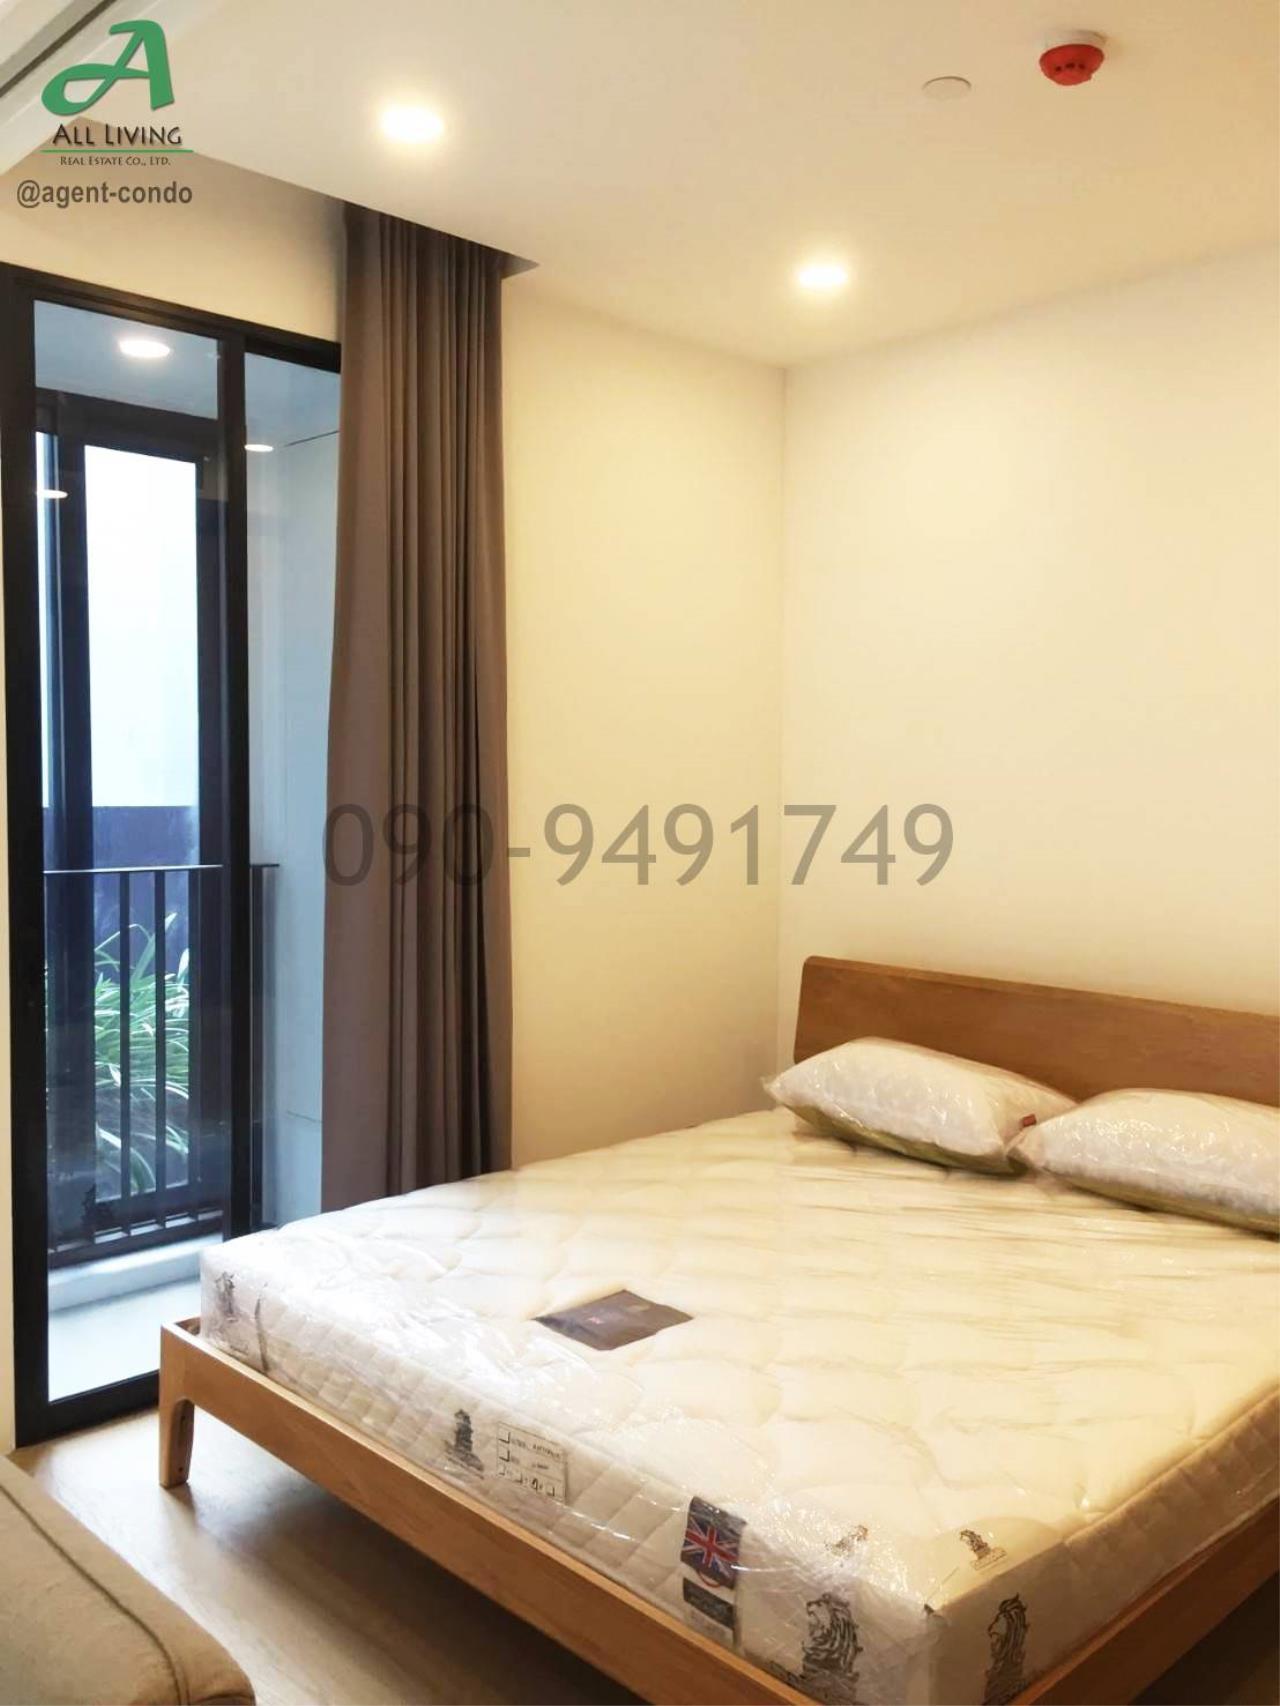 All Living Real Estate Co., Ltd Agency's Ashton Chula-Silom 6